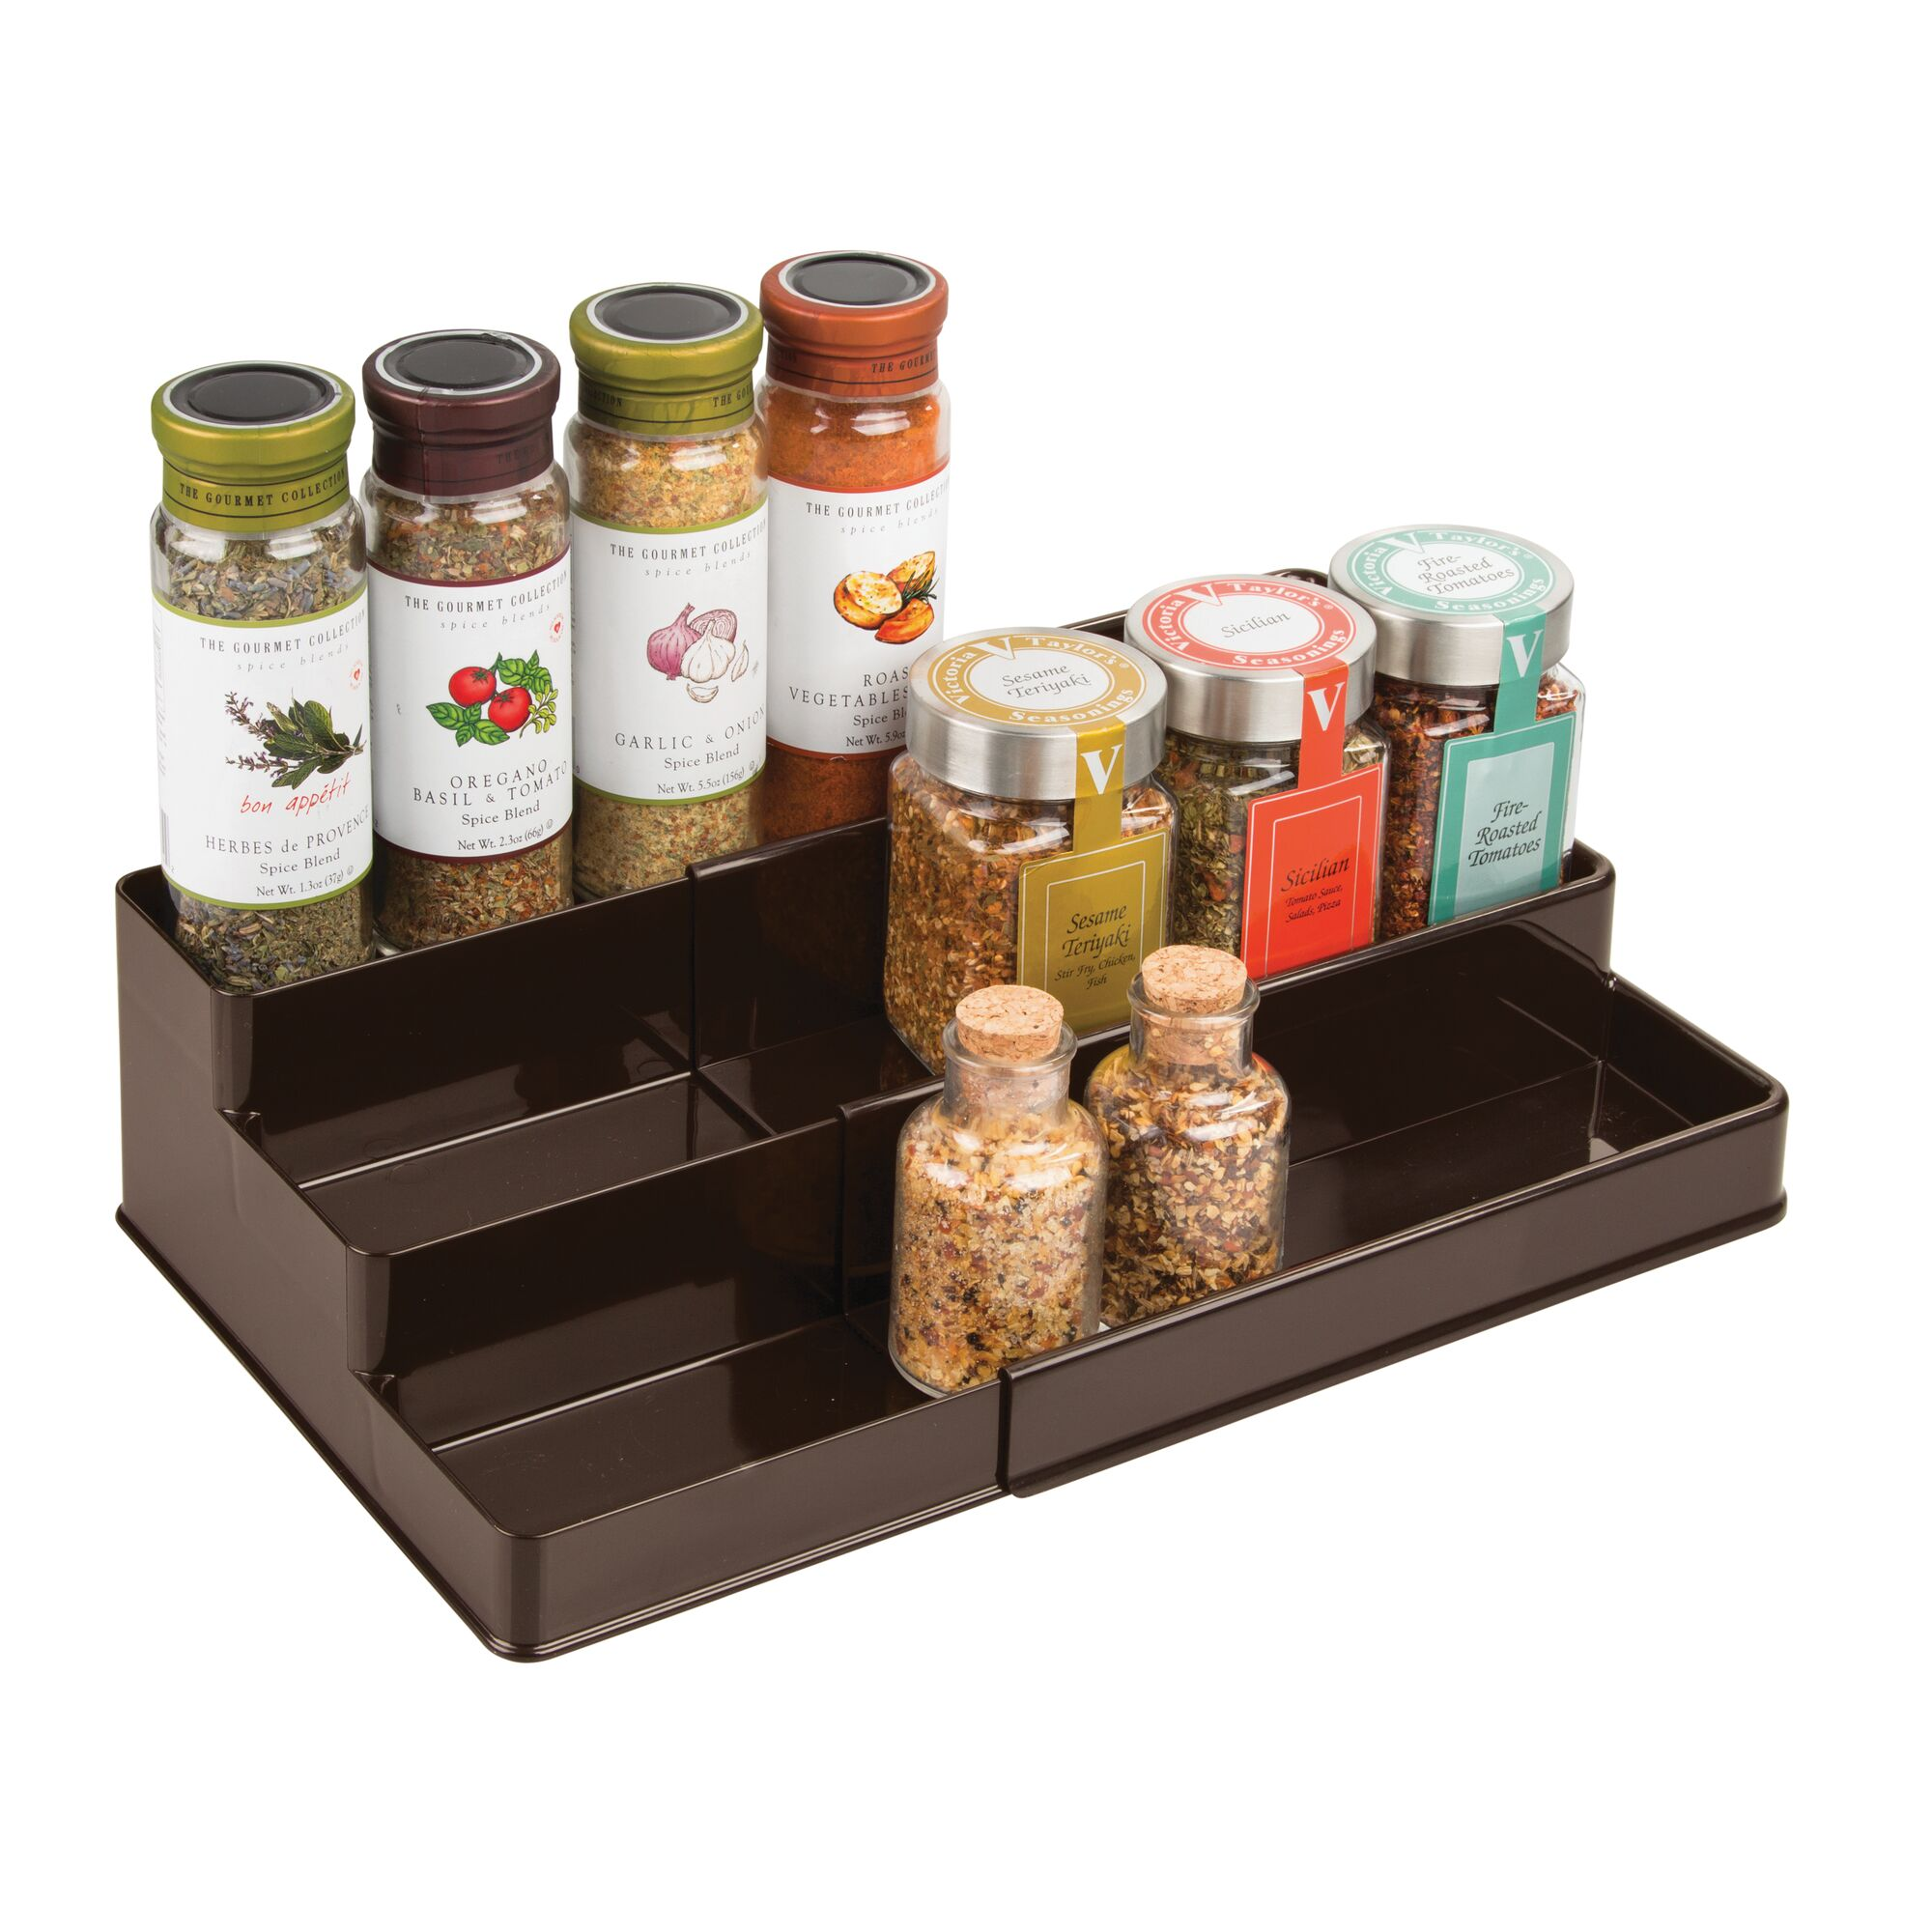 mDesign-Expandable-Kitchen-Cabinet-Pantry-Organizer-Spice-Rack thumbnail 18